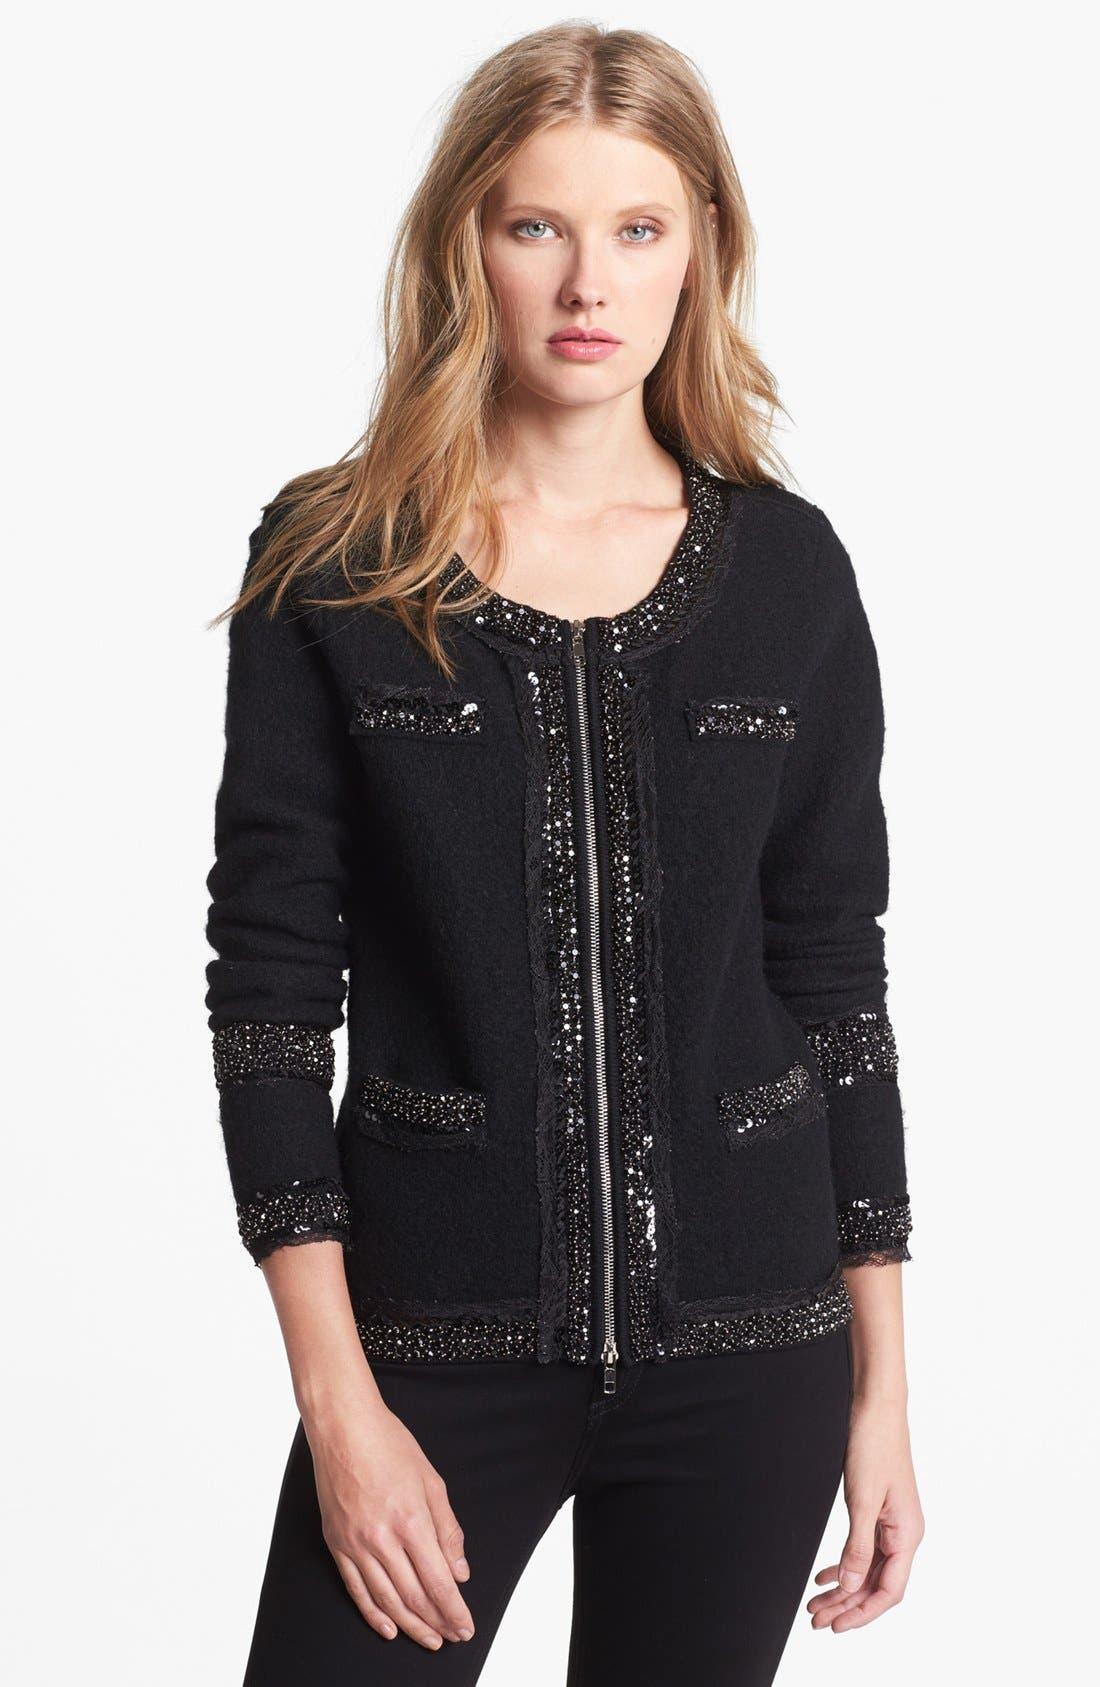 Main Image - Diane von Furstenberg Embellished Front Zip Wool Sweater